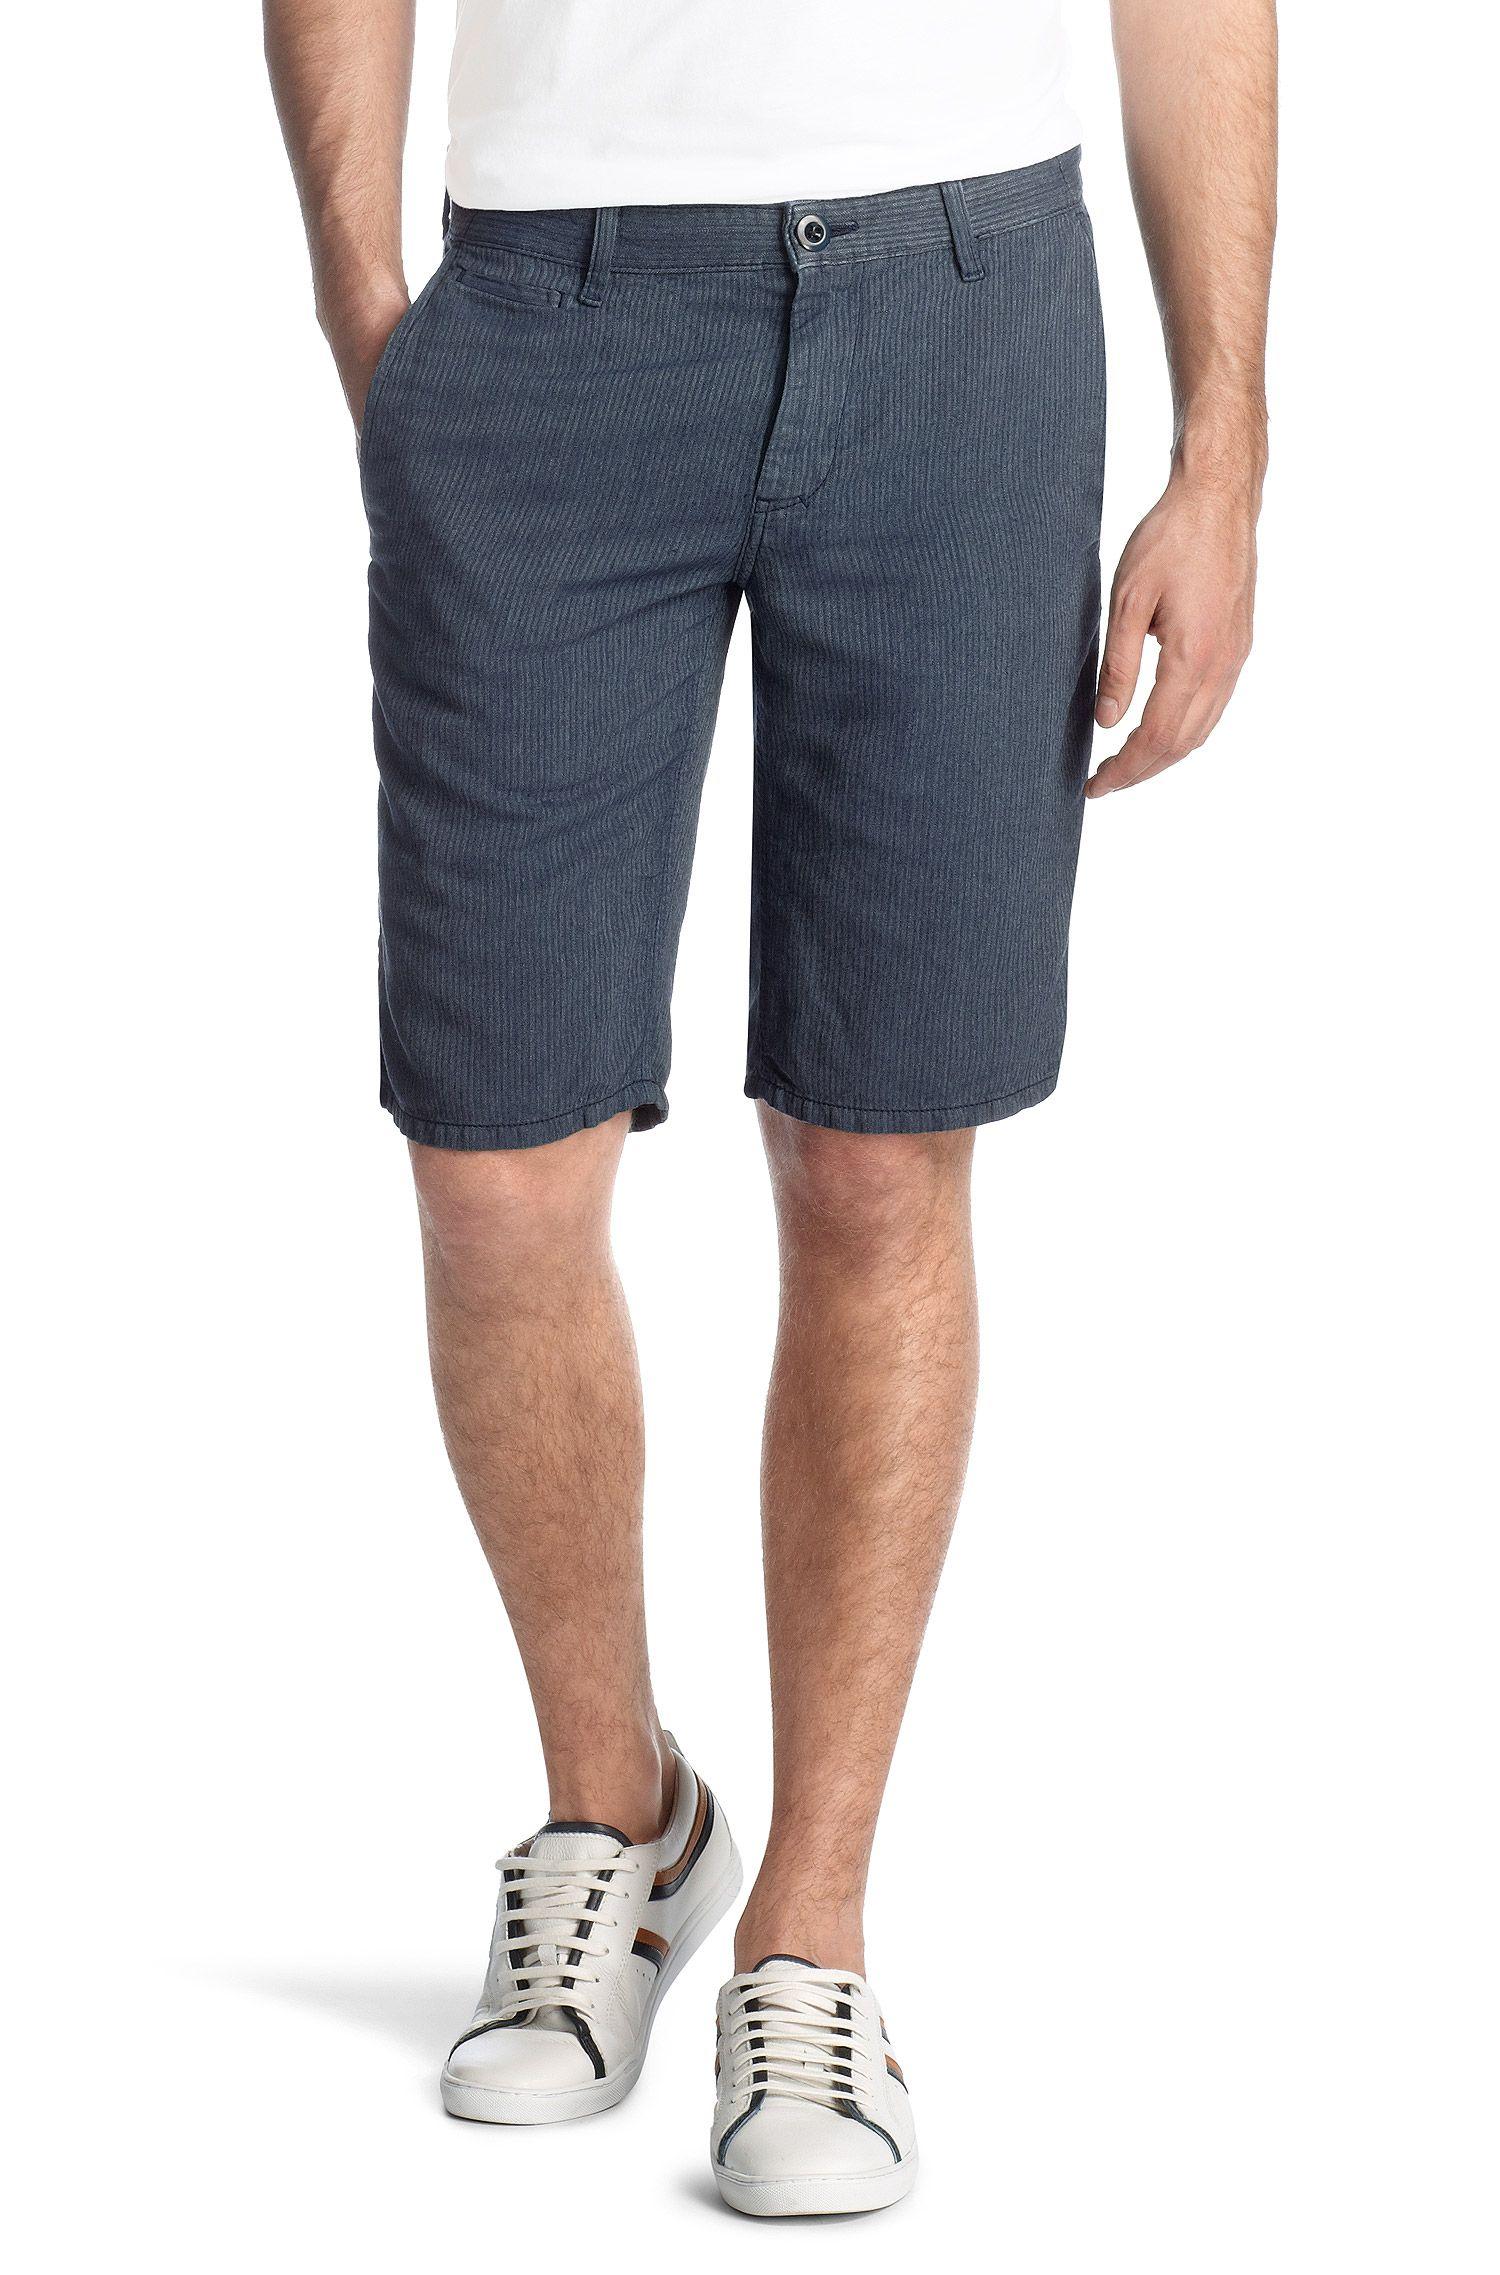 Short ´Shure-Shorts-D` in 5-pocket-stijl